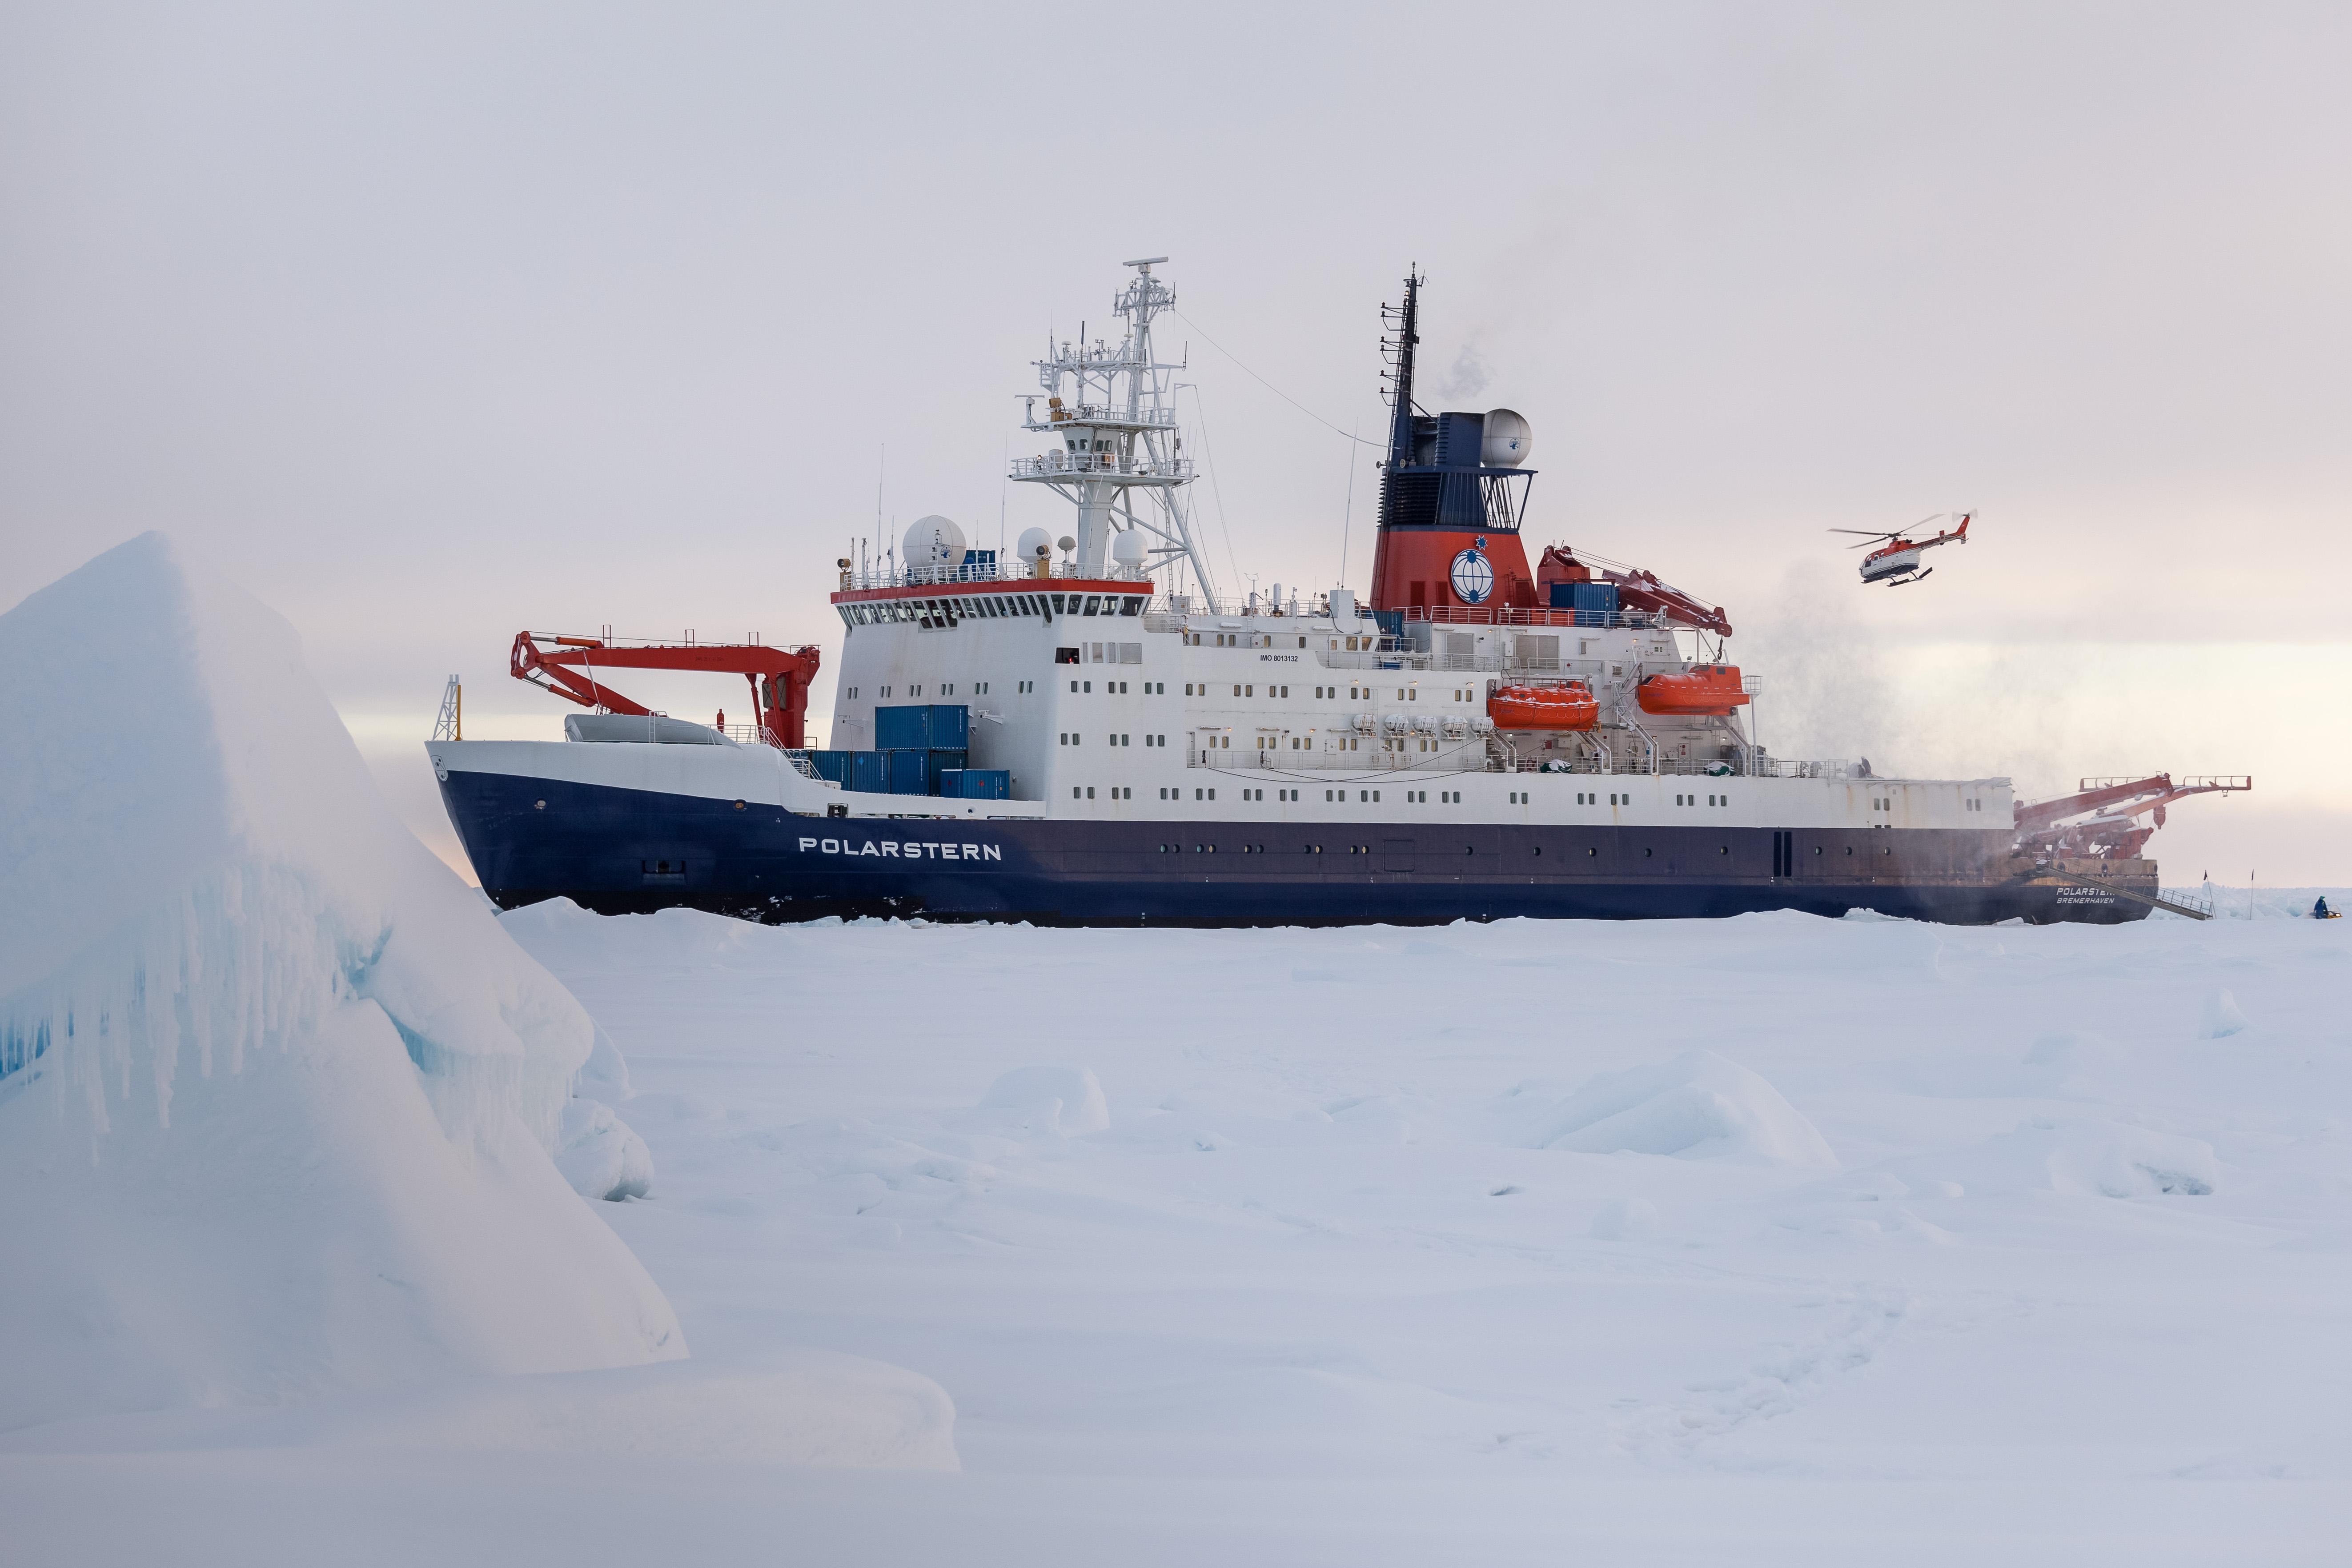 Preparing for sea ice station. Photo: Mario Hoppmann, AWI